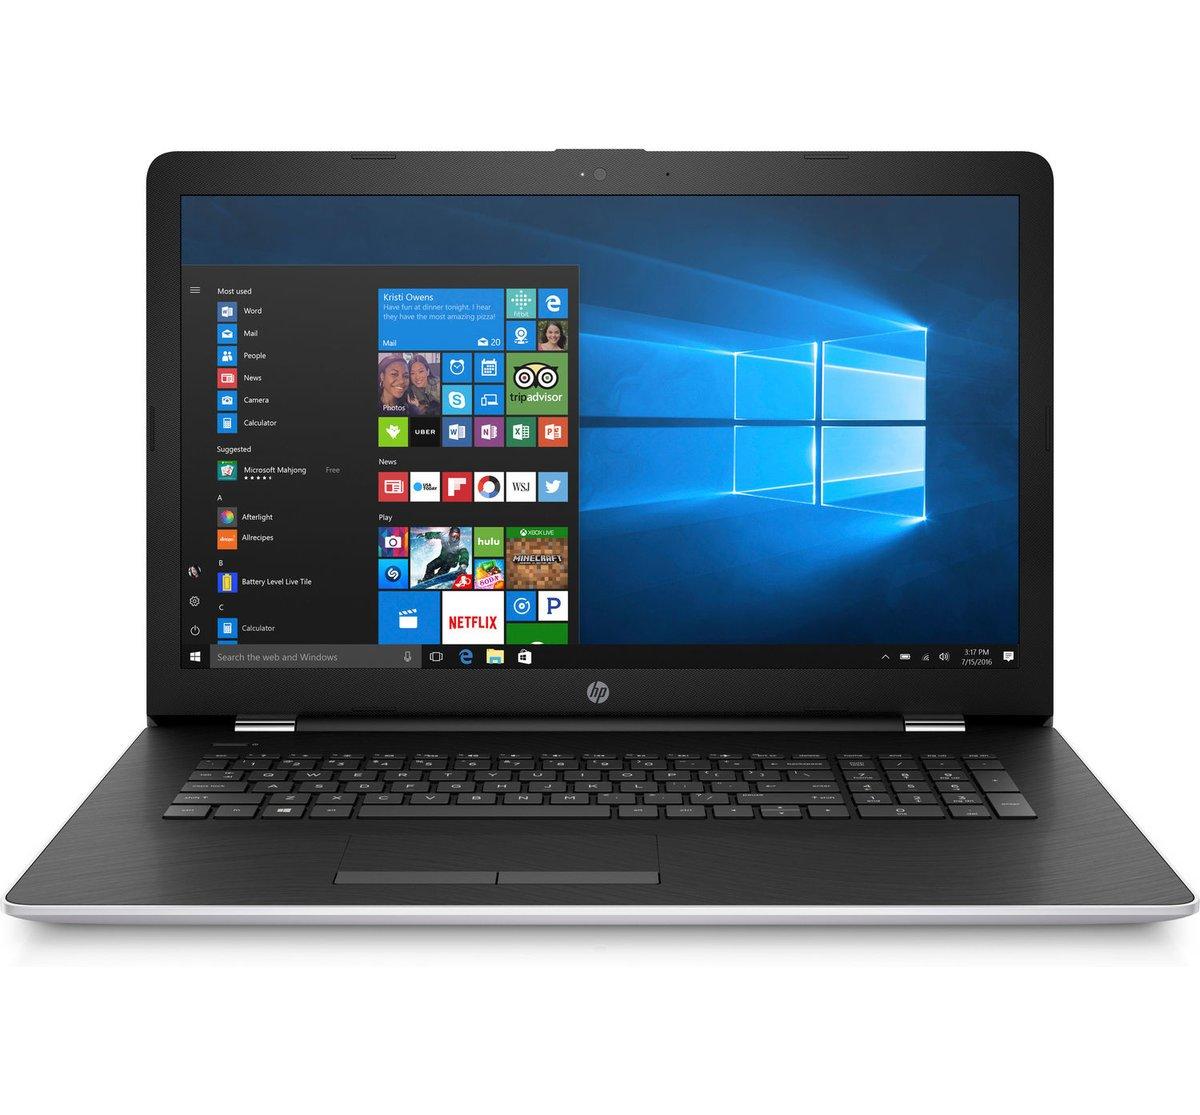 2018 HP 17.3'' Full HD IPS Business Gaming Laptop - Intel Dual-Core i7-7500U Up to 3.5GHz, 16GB DDR4, 1TB SSD, DVDRW, 4GB AMD Radeon 530, WLAN, Bluetooth, Webcam, Backlit Keyboard, Win 10